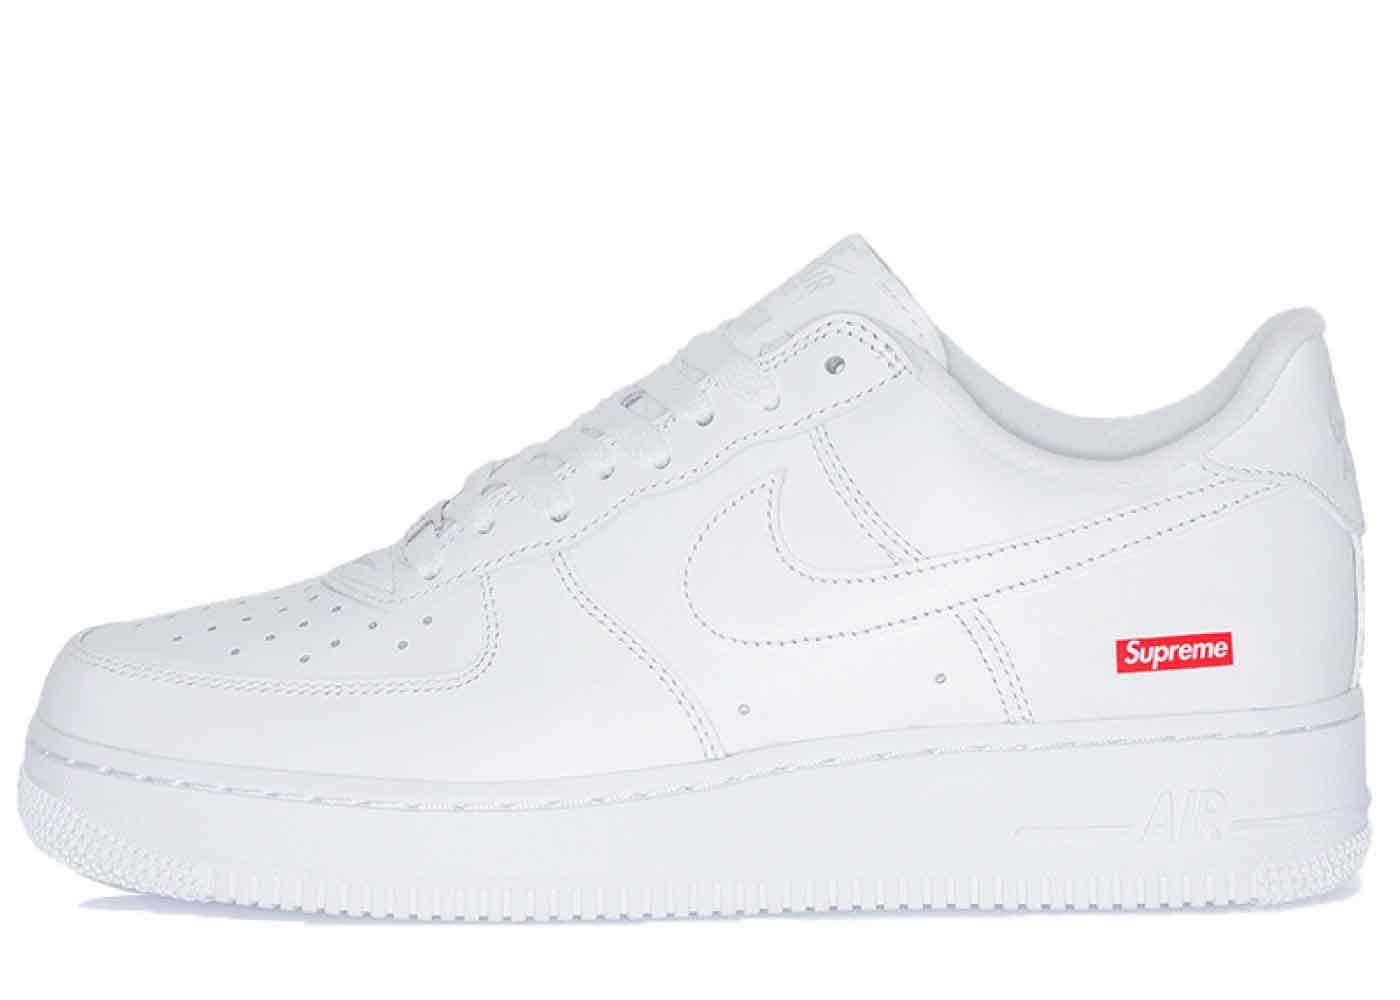 Nike Air Force 1 Low Supreme Whiteの写真